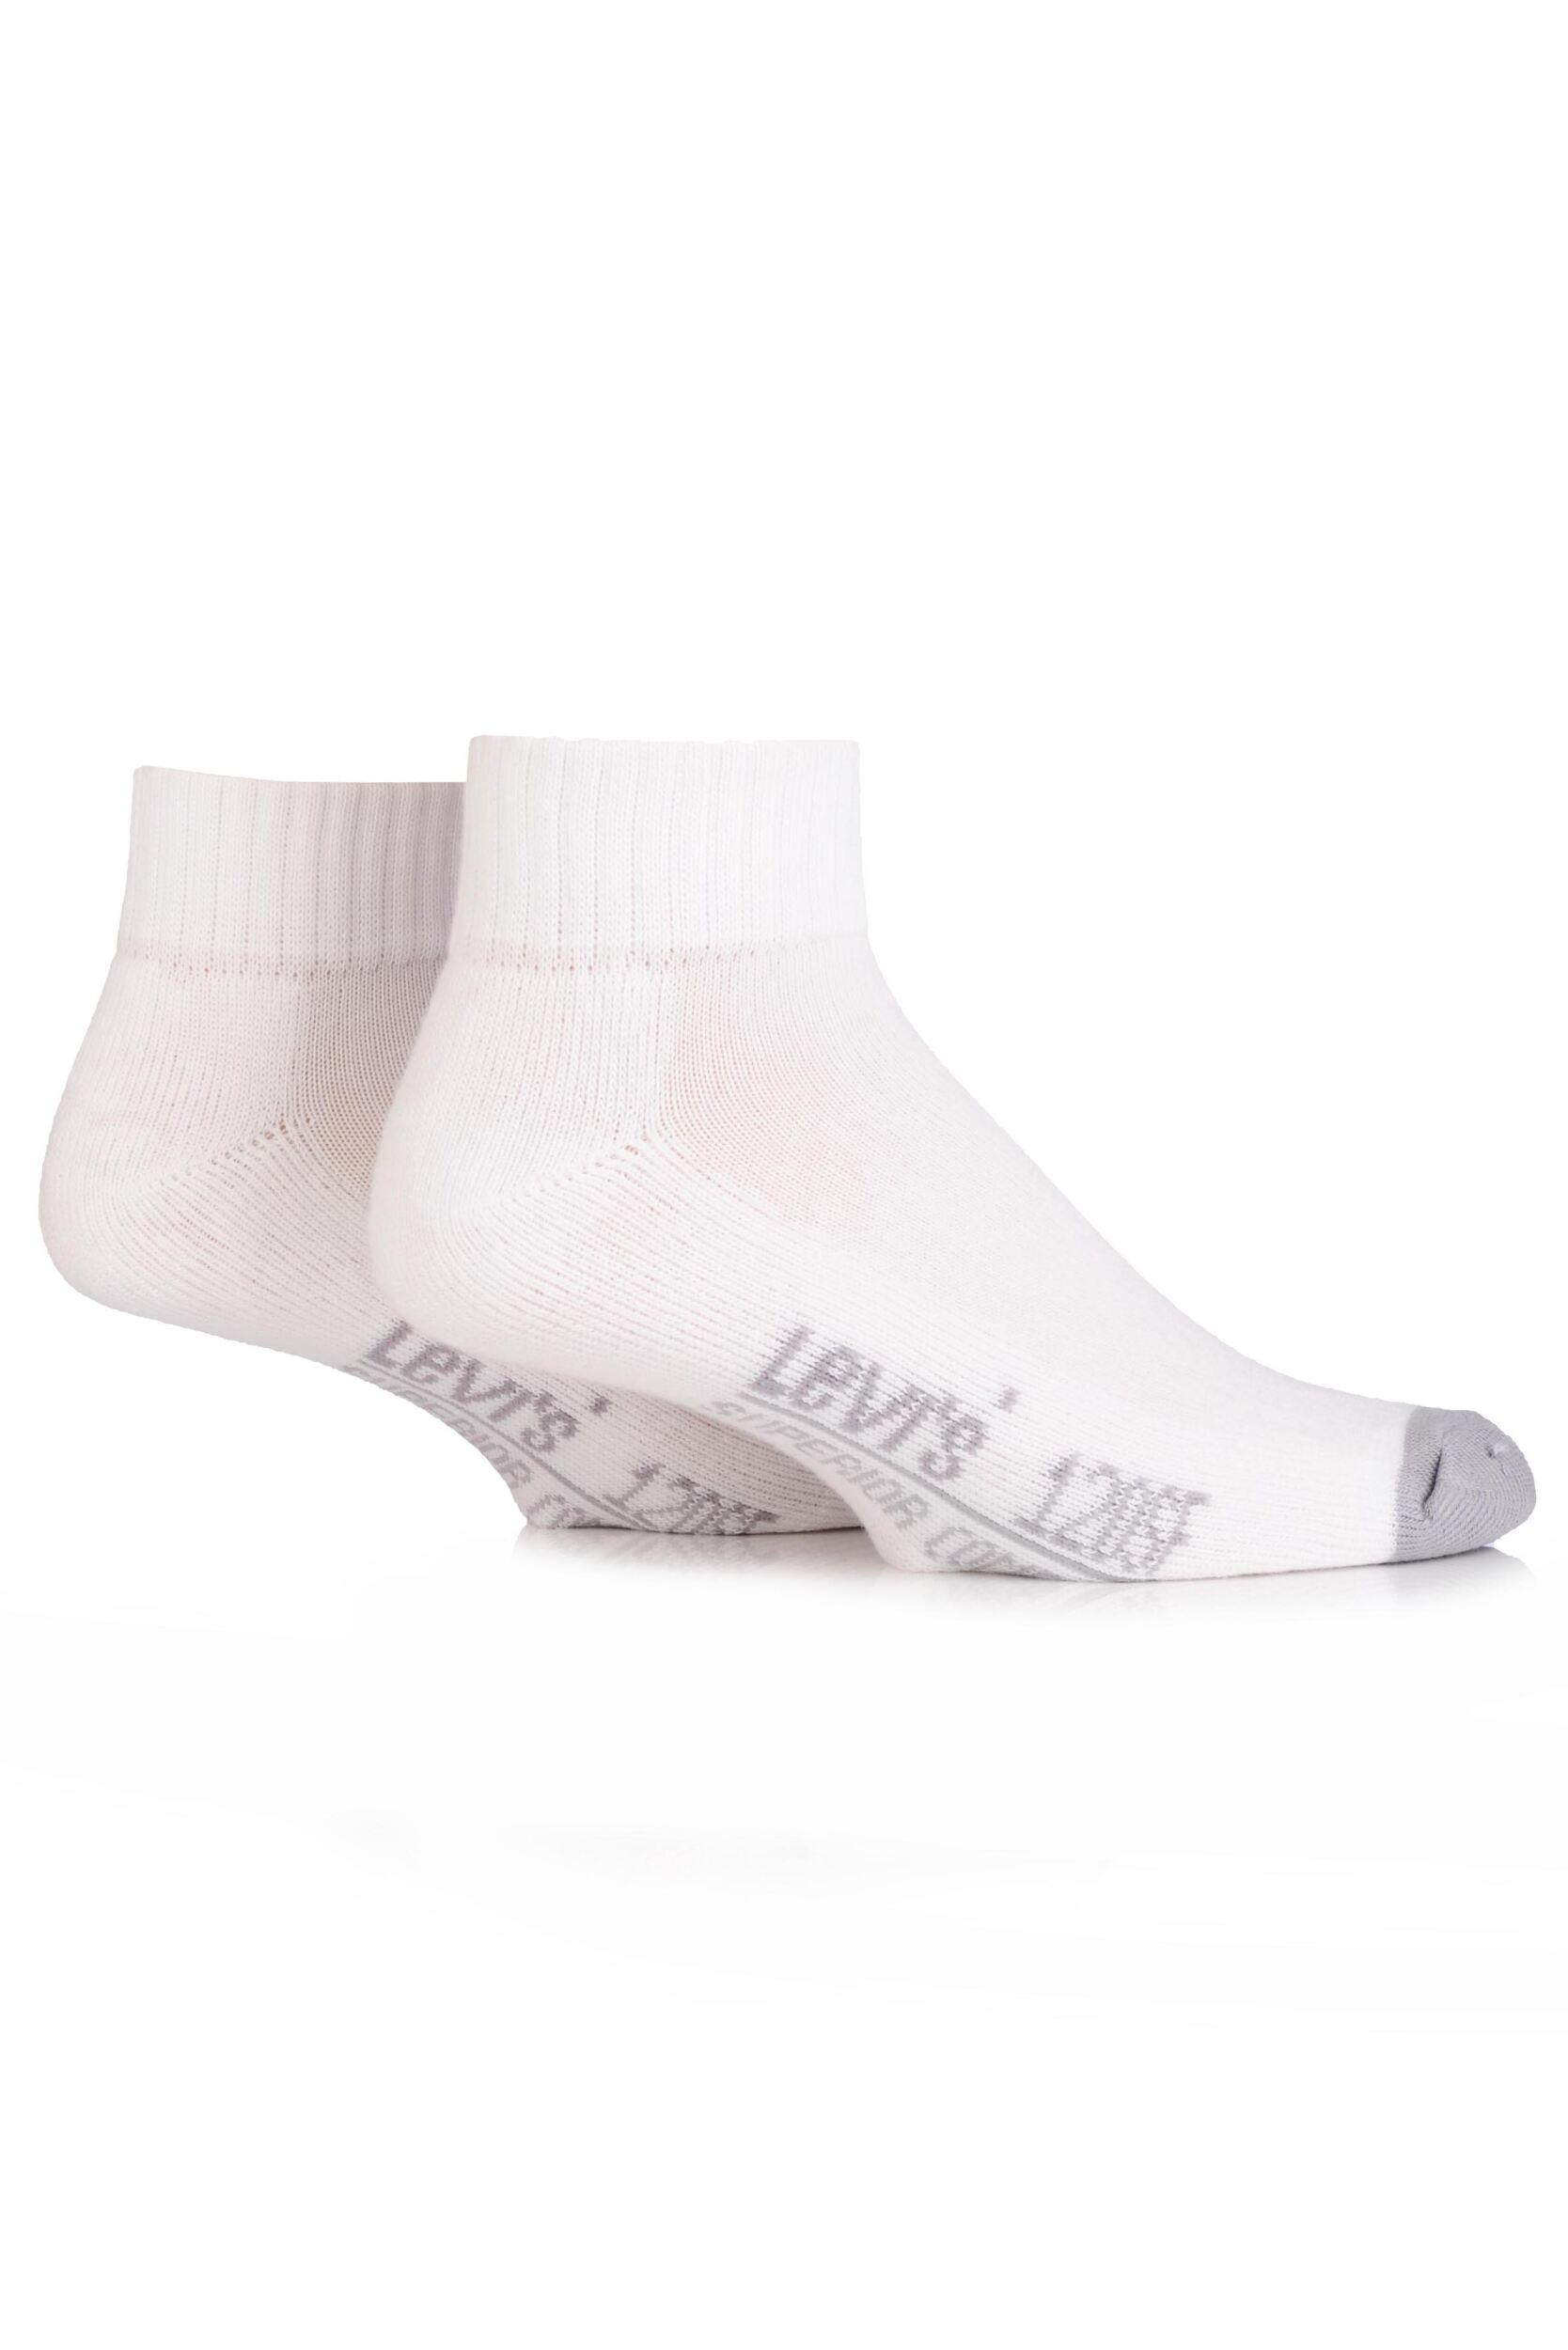 Image of Mens 2 Pair Levis 120SF Plain Cushioned Mid Cut Socks